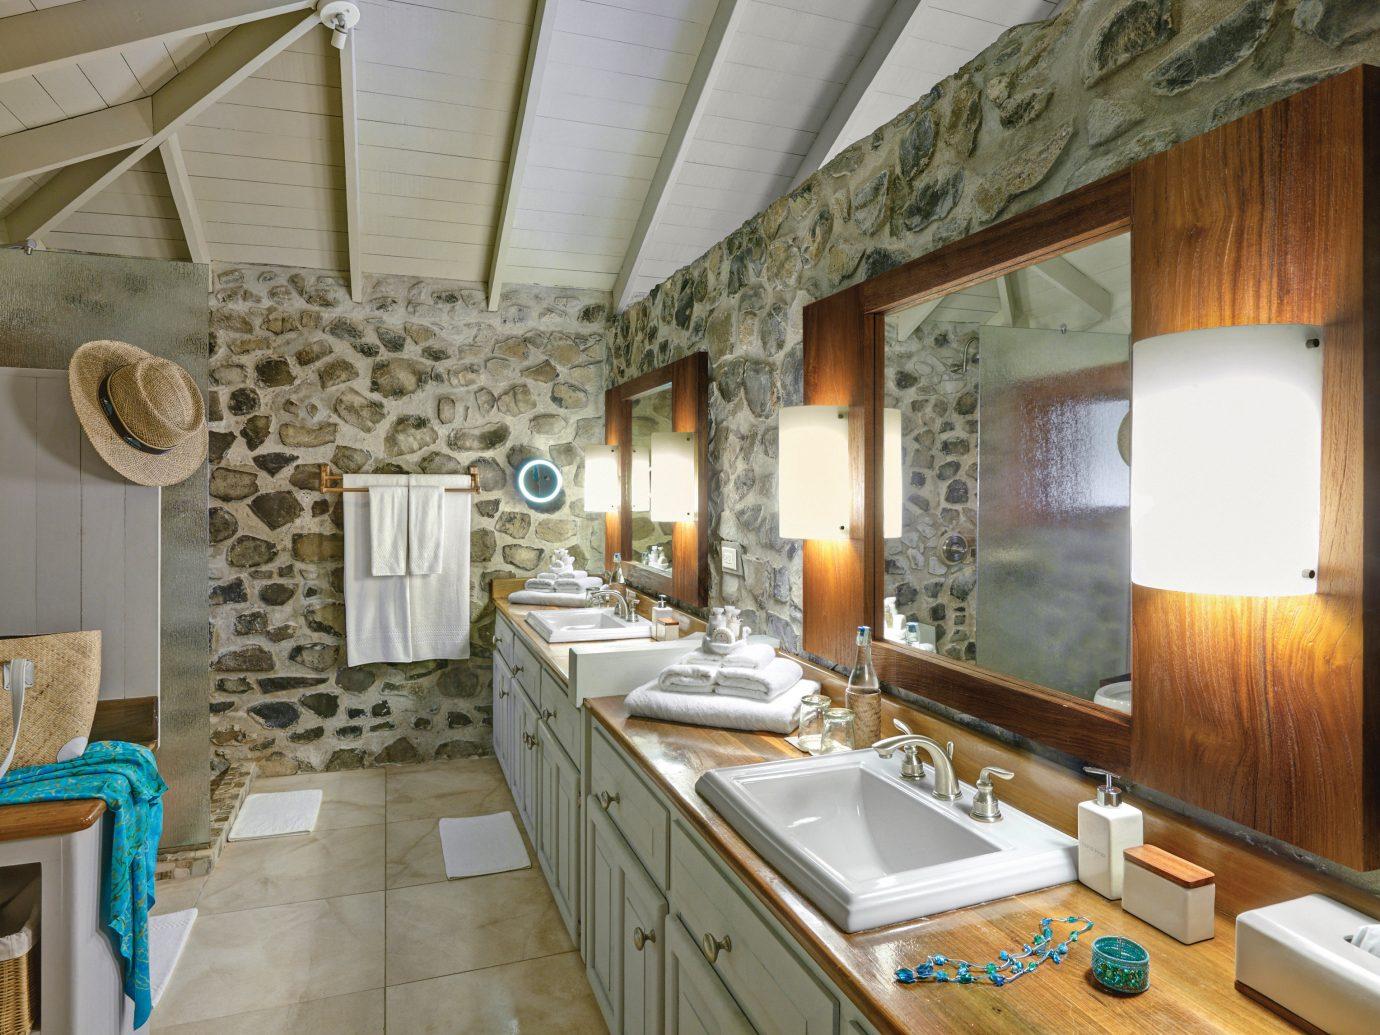 All-Inclusive Resorts Beach Hotels indoor countertop room interior design ceiling real estate counter estate flooring Kitchen interior designer bathroom